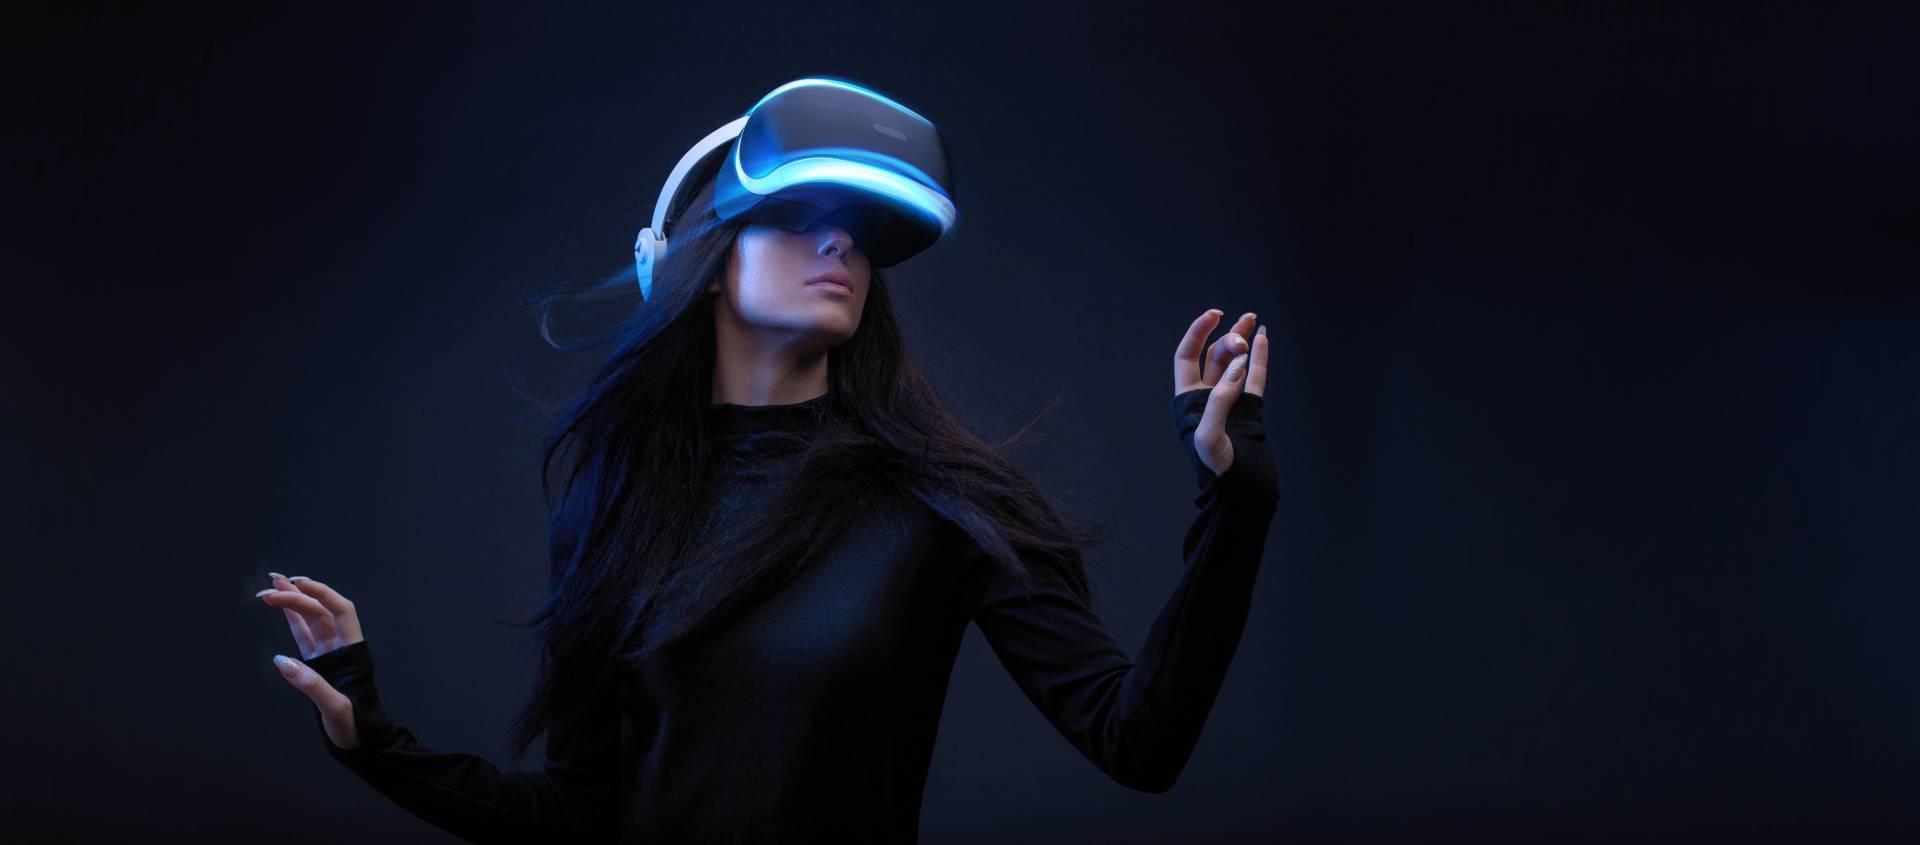 Woman in futuristic VR headset